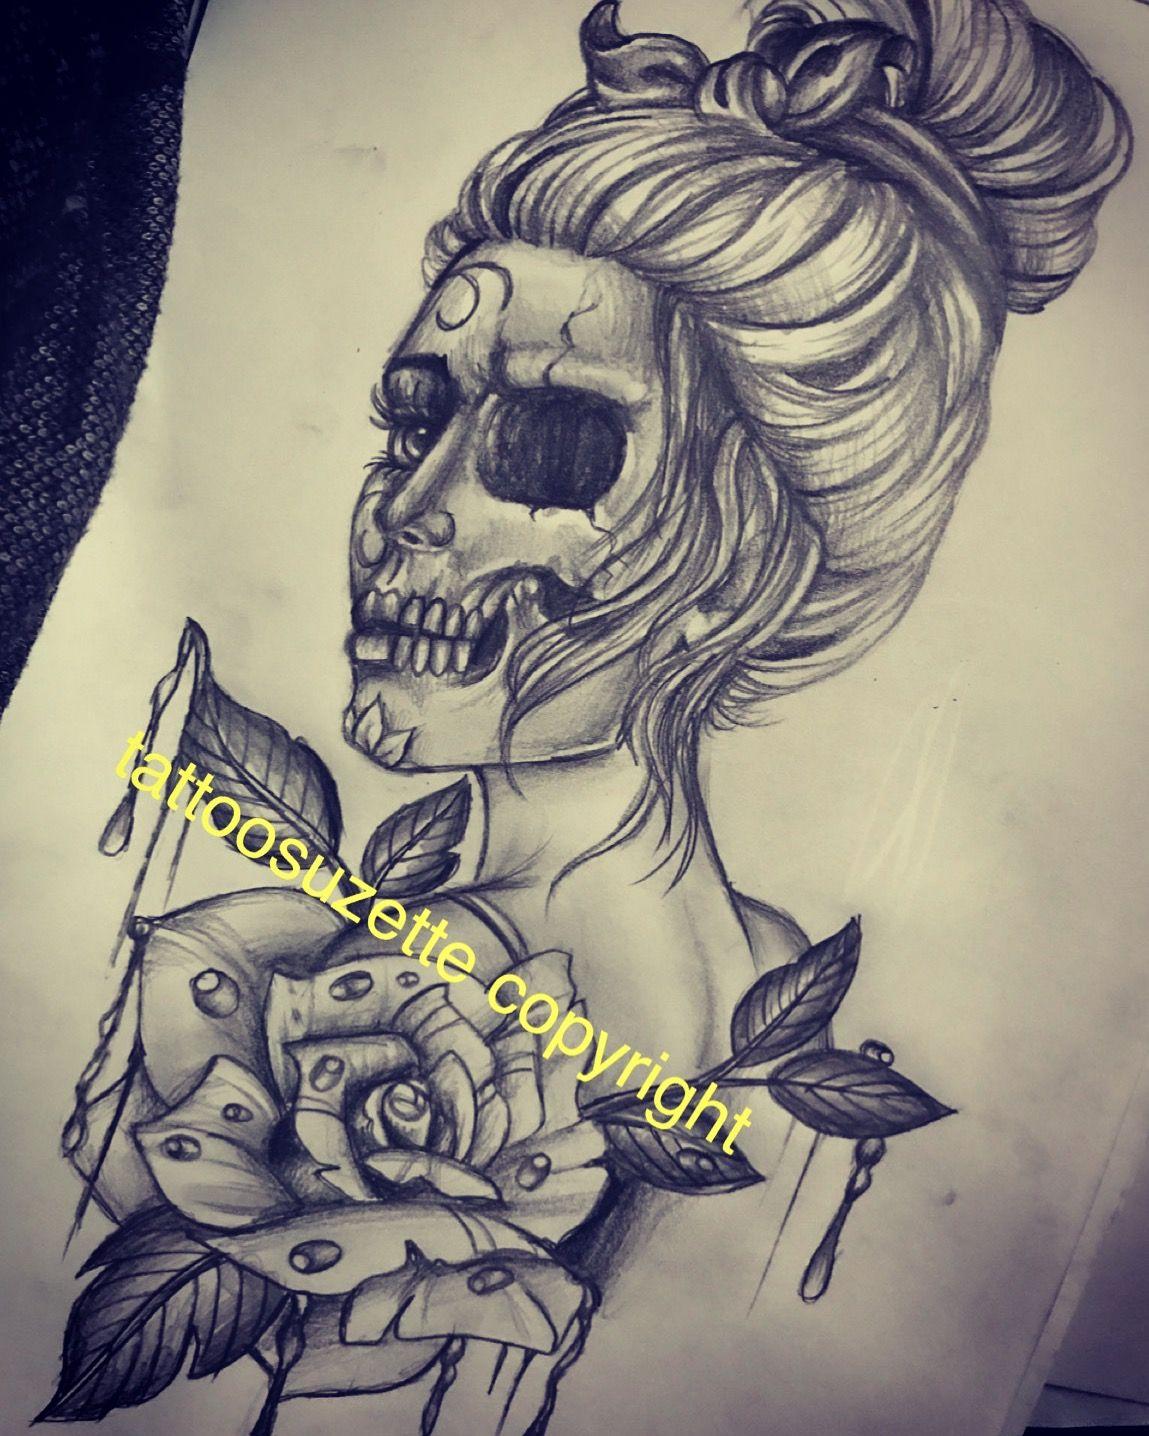 Santa Muerte Tattoo Design Tattoos Tattoos For Women Tattoo Designs